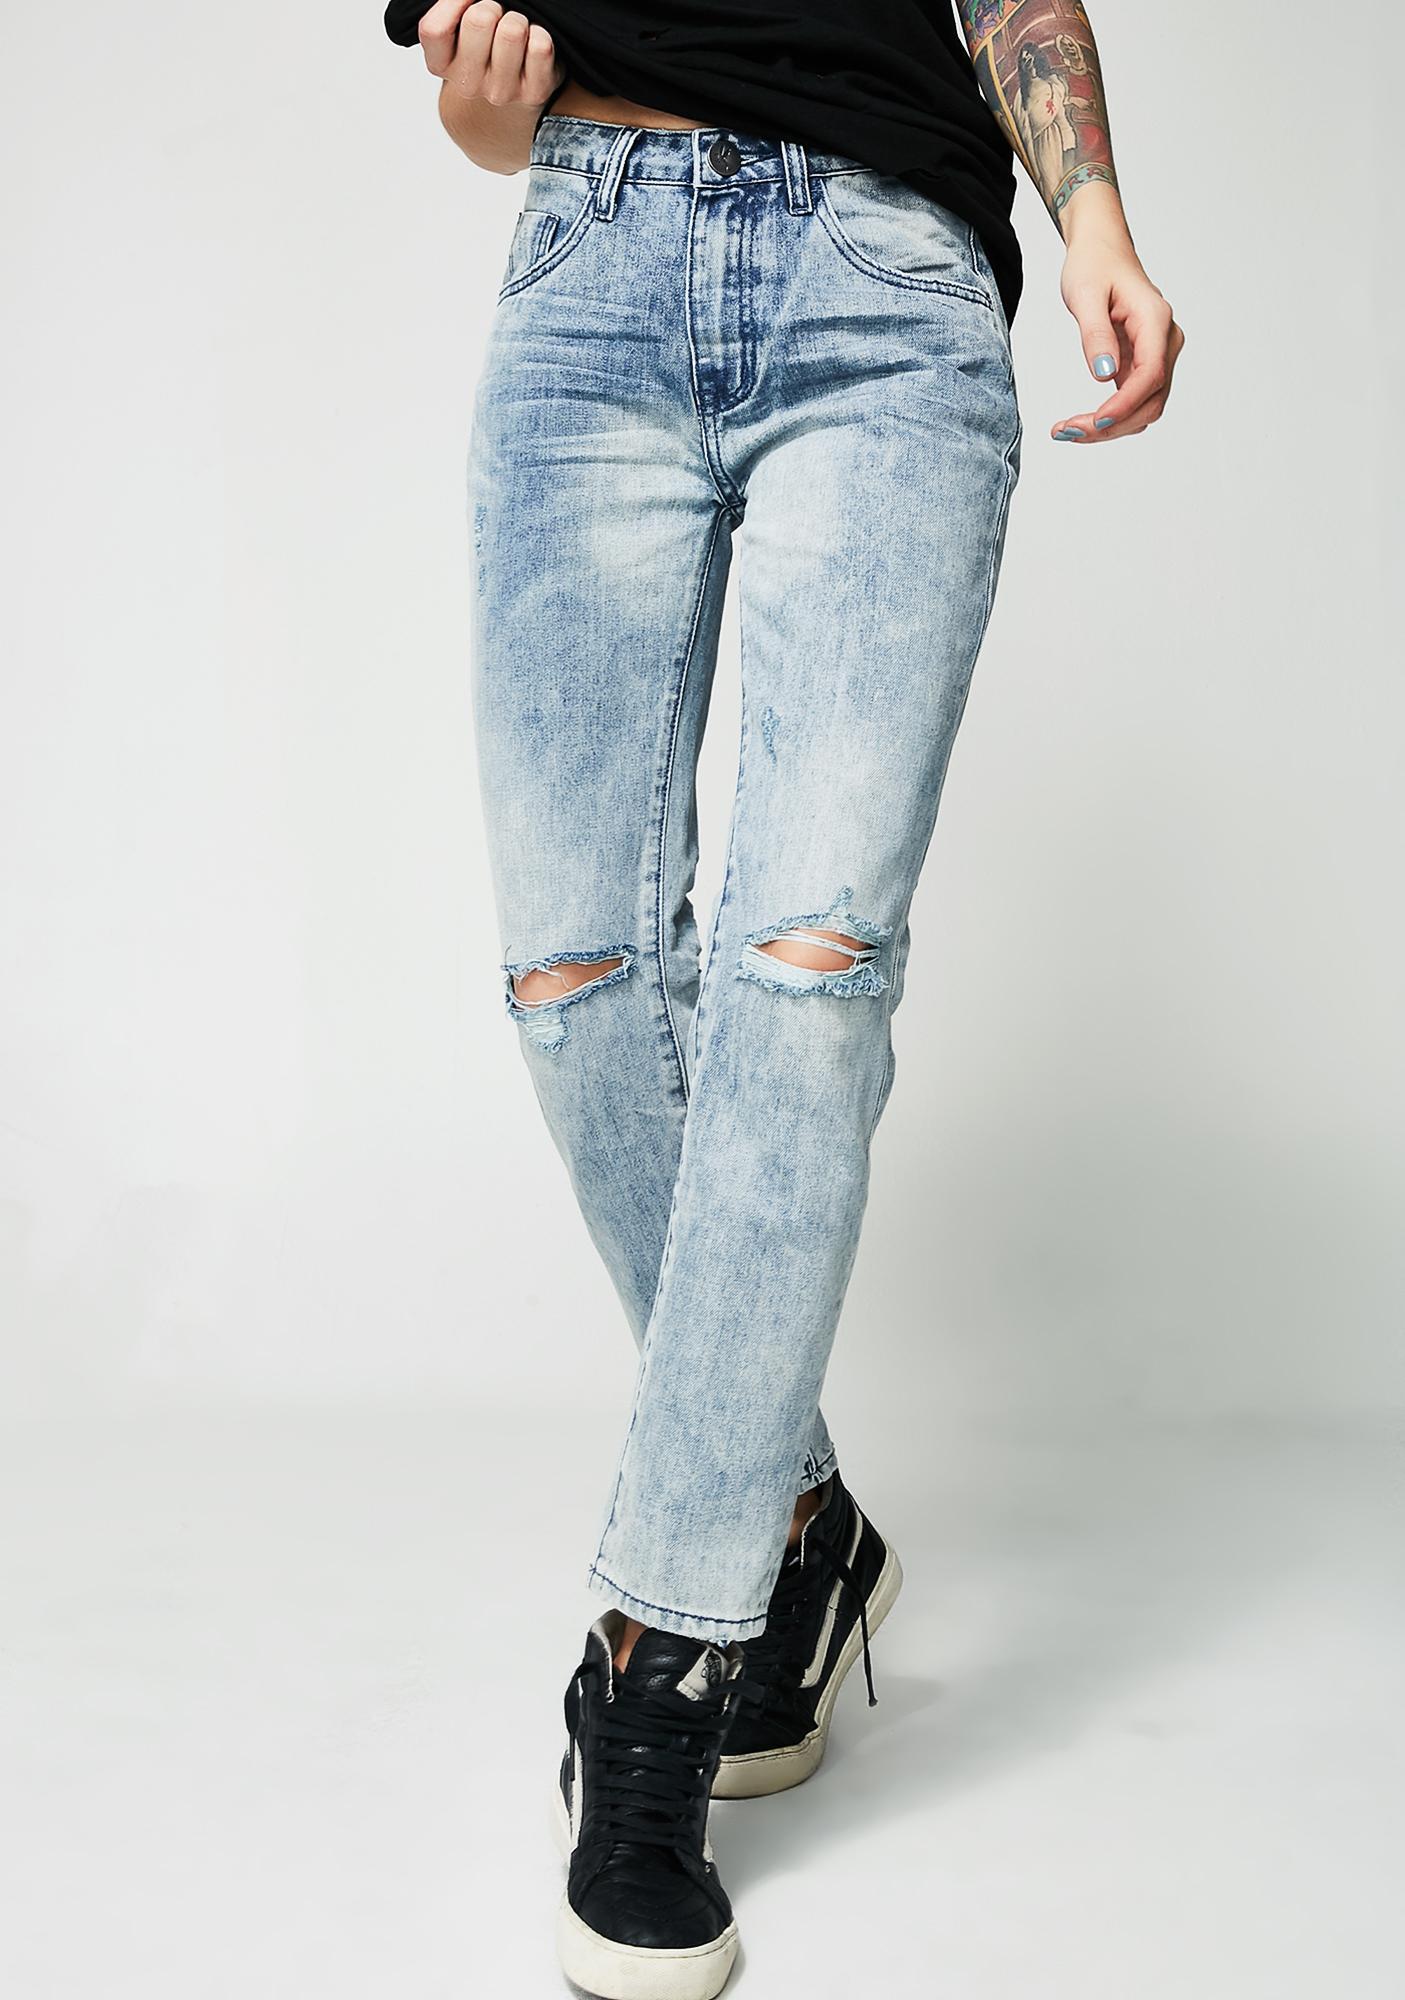 One Teaspoon Awesome Baggies High Waist Jeans